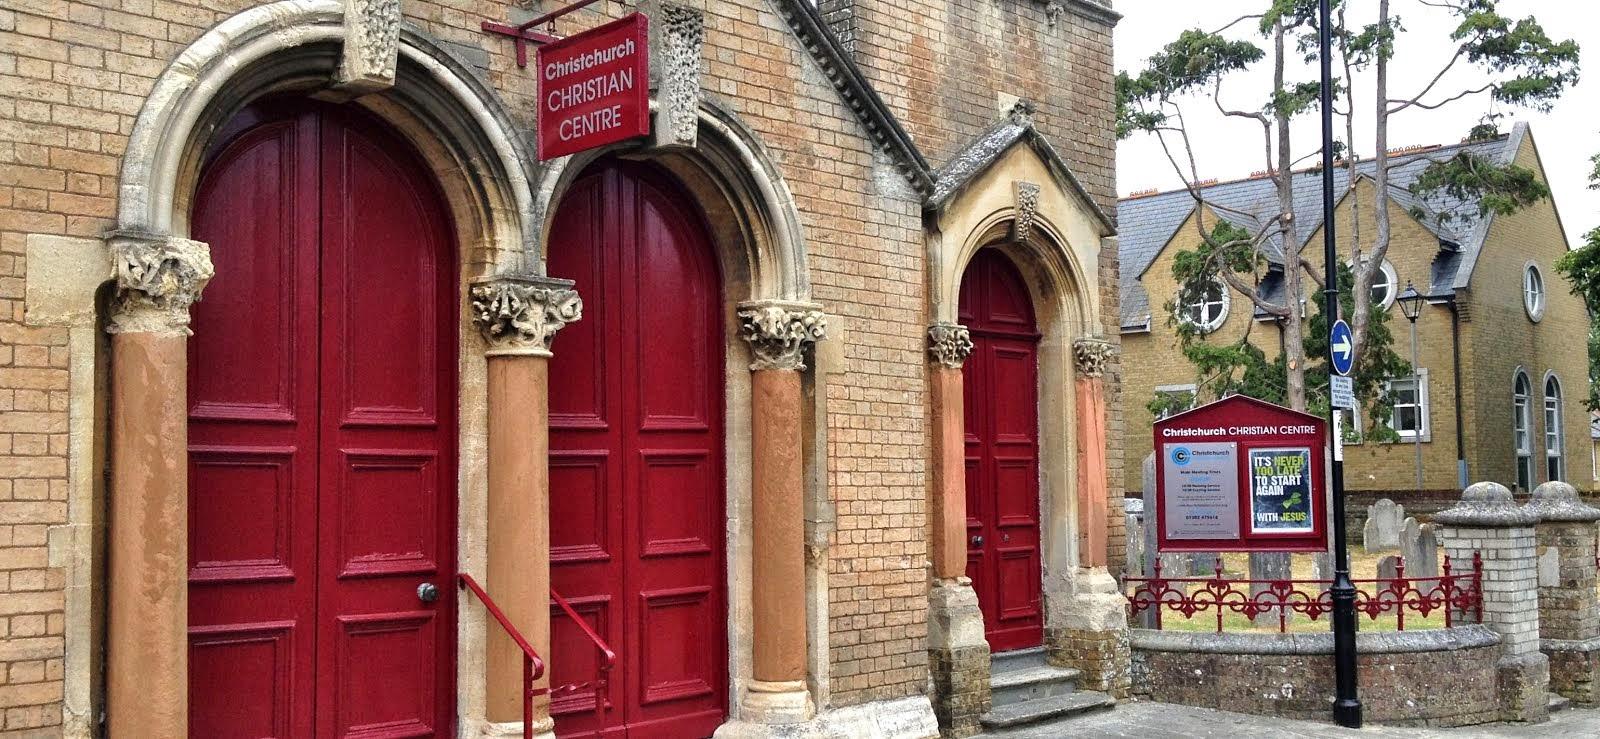 Christchurch Christian Centre UK